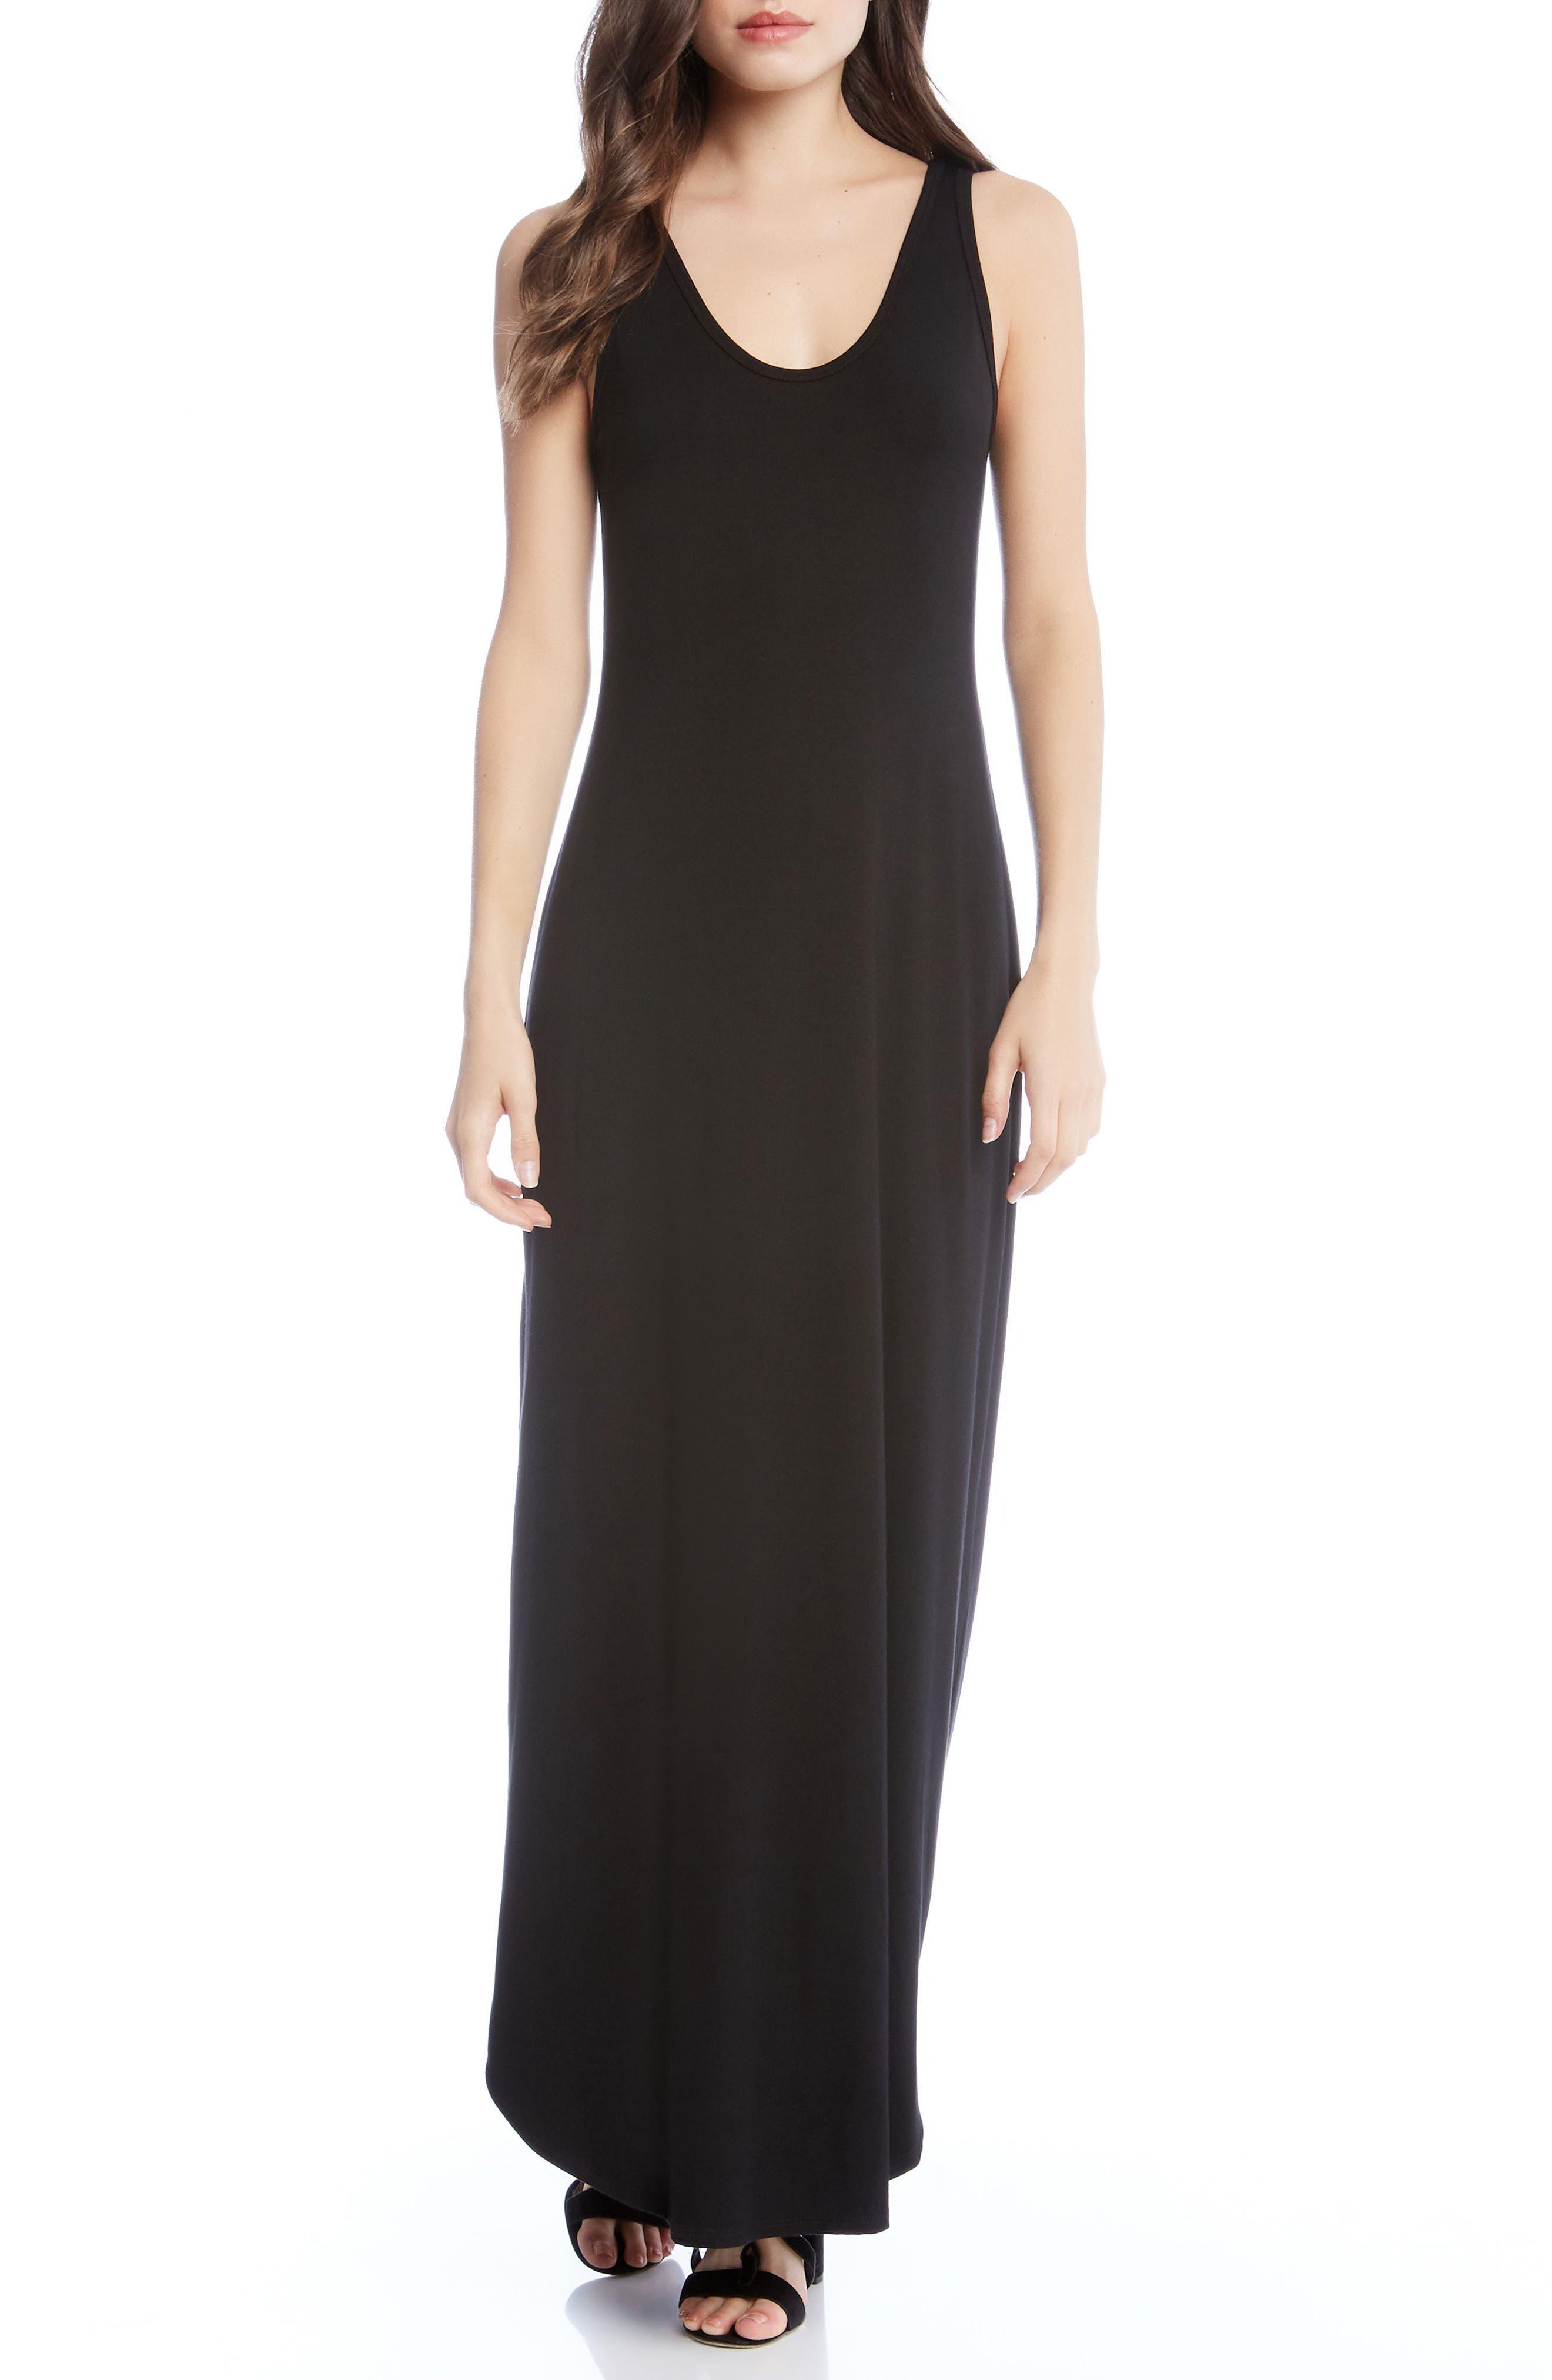 Zipped Side Slit Maxi Dress,                         Main,                         color, Black